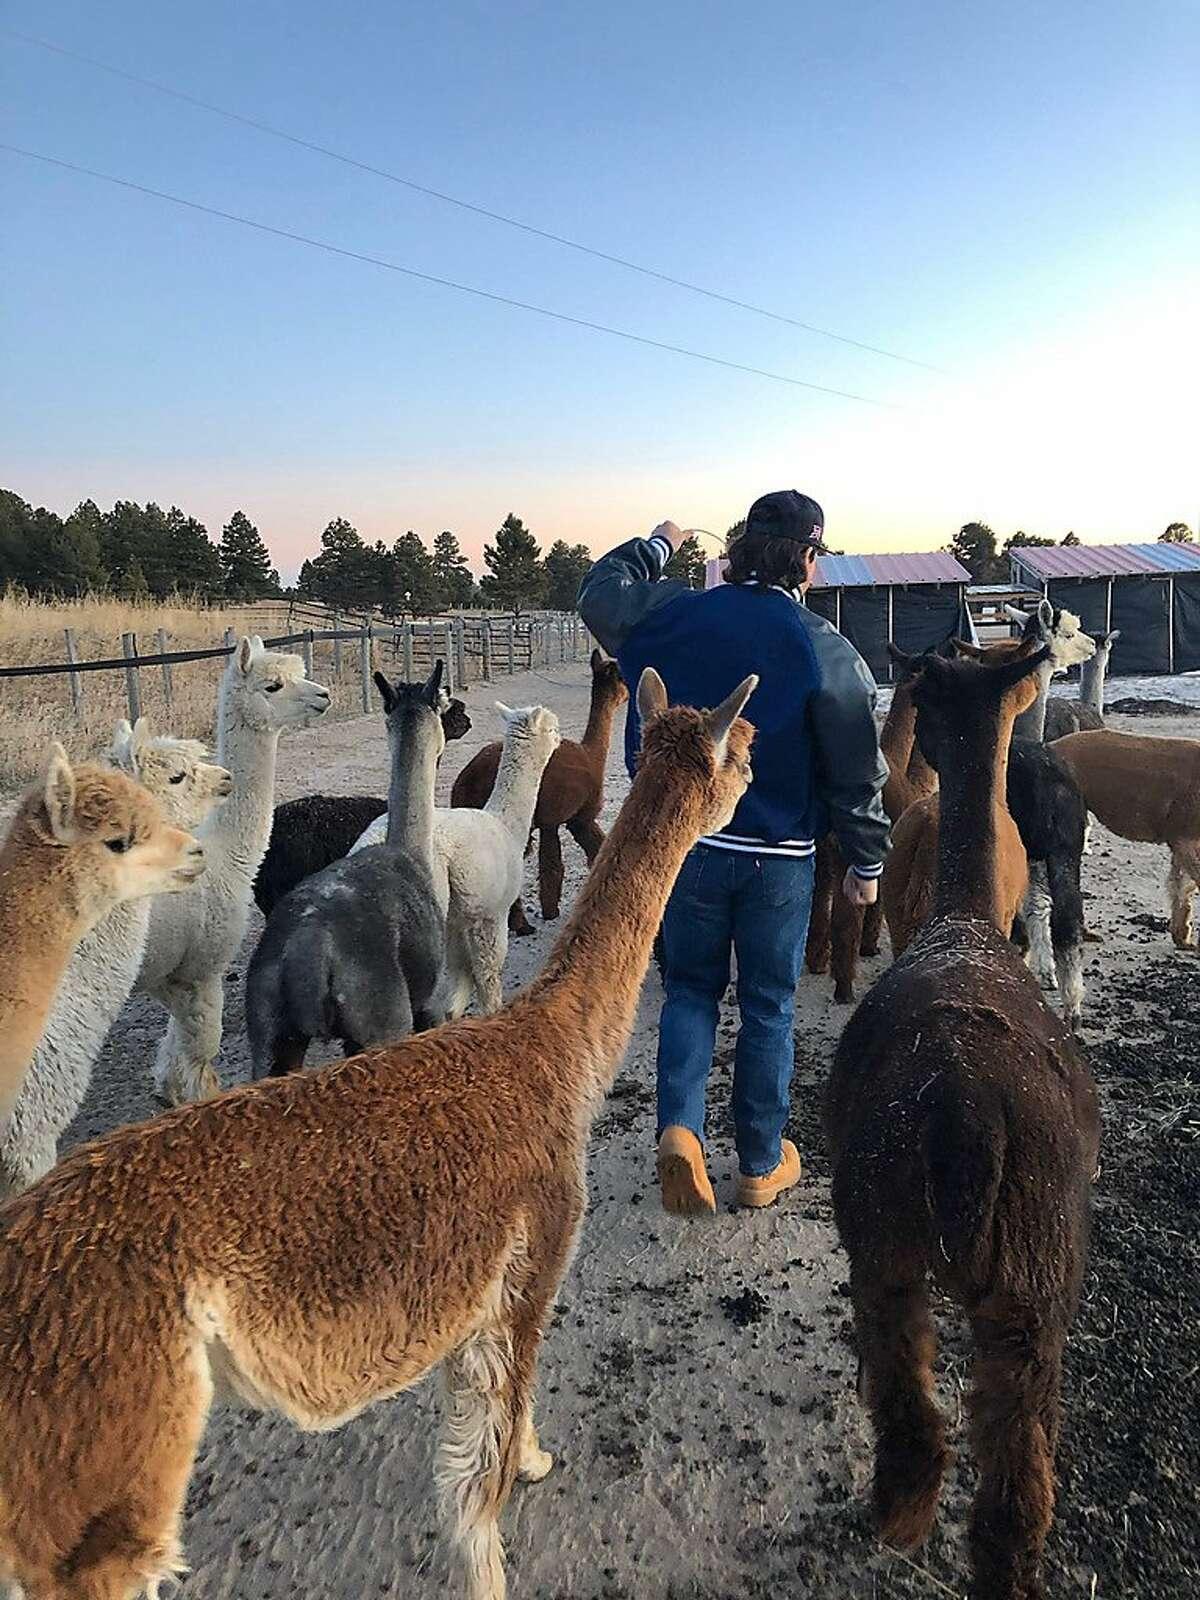 Drew Schlegel chases alpacas on shearing day at Cloverleaf Farm in Elizabeth, Colo. The Cal fullback has a retirement plan that includes farming alpacas.